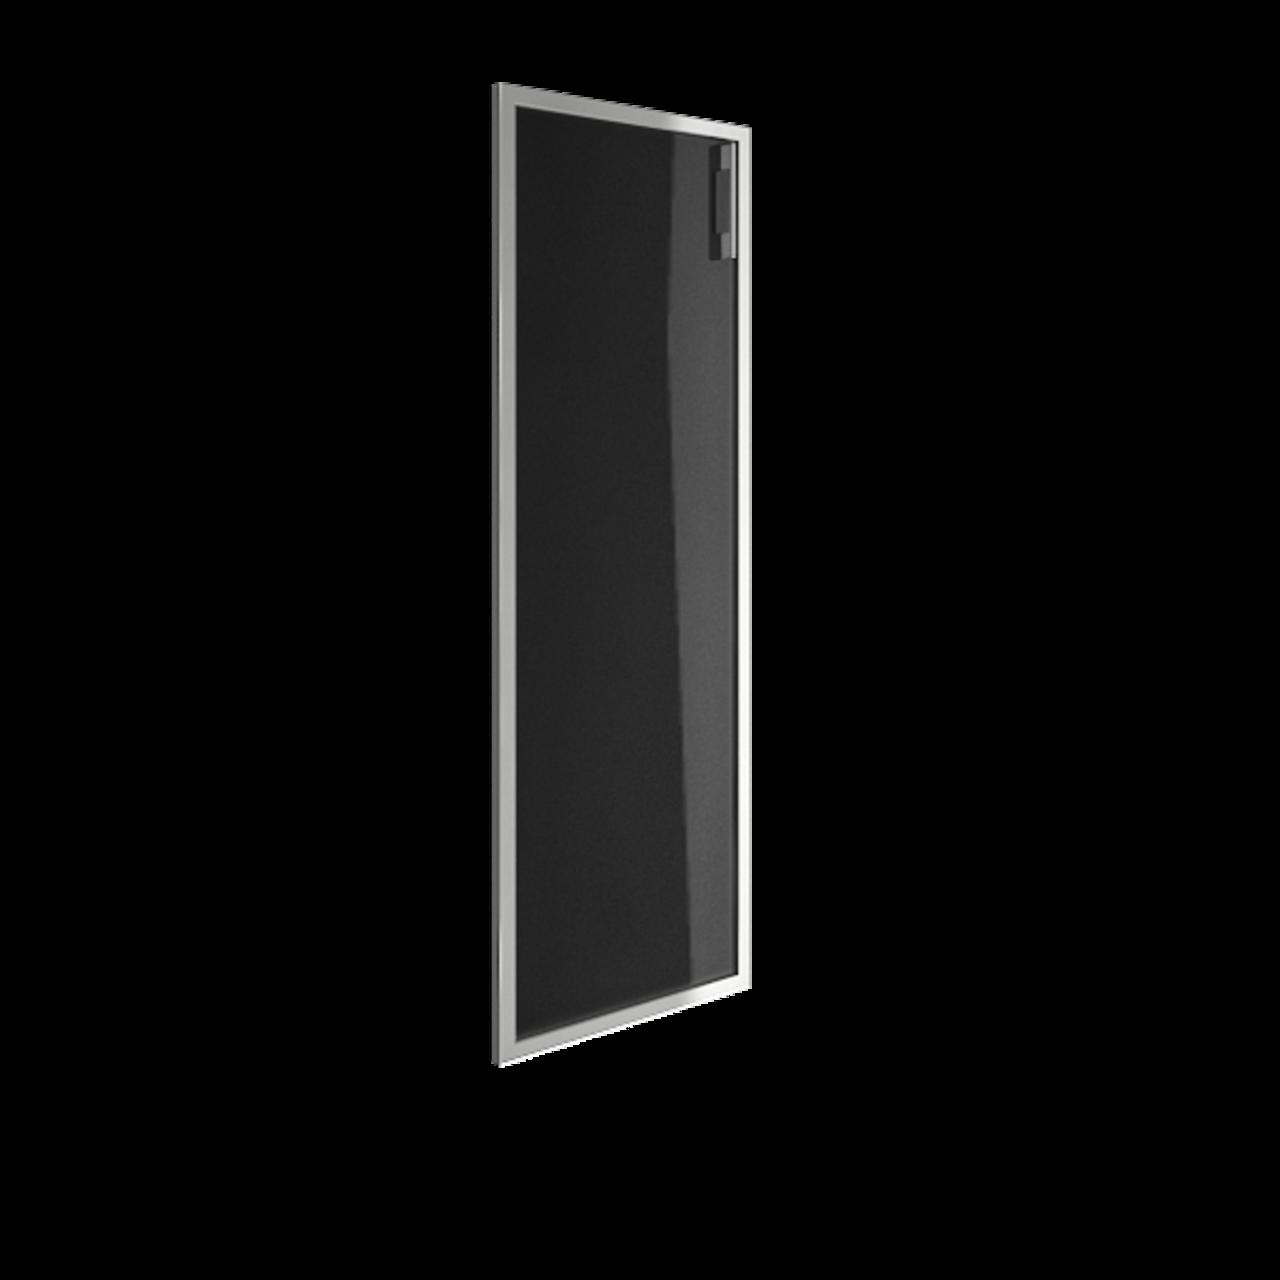 Дверь стекло в раме среднее Lacobel black левая - фото 1